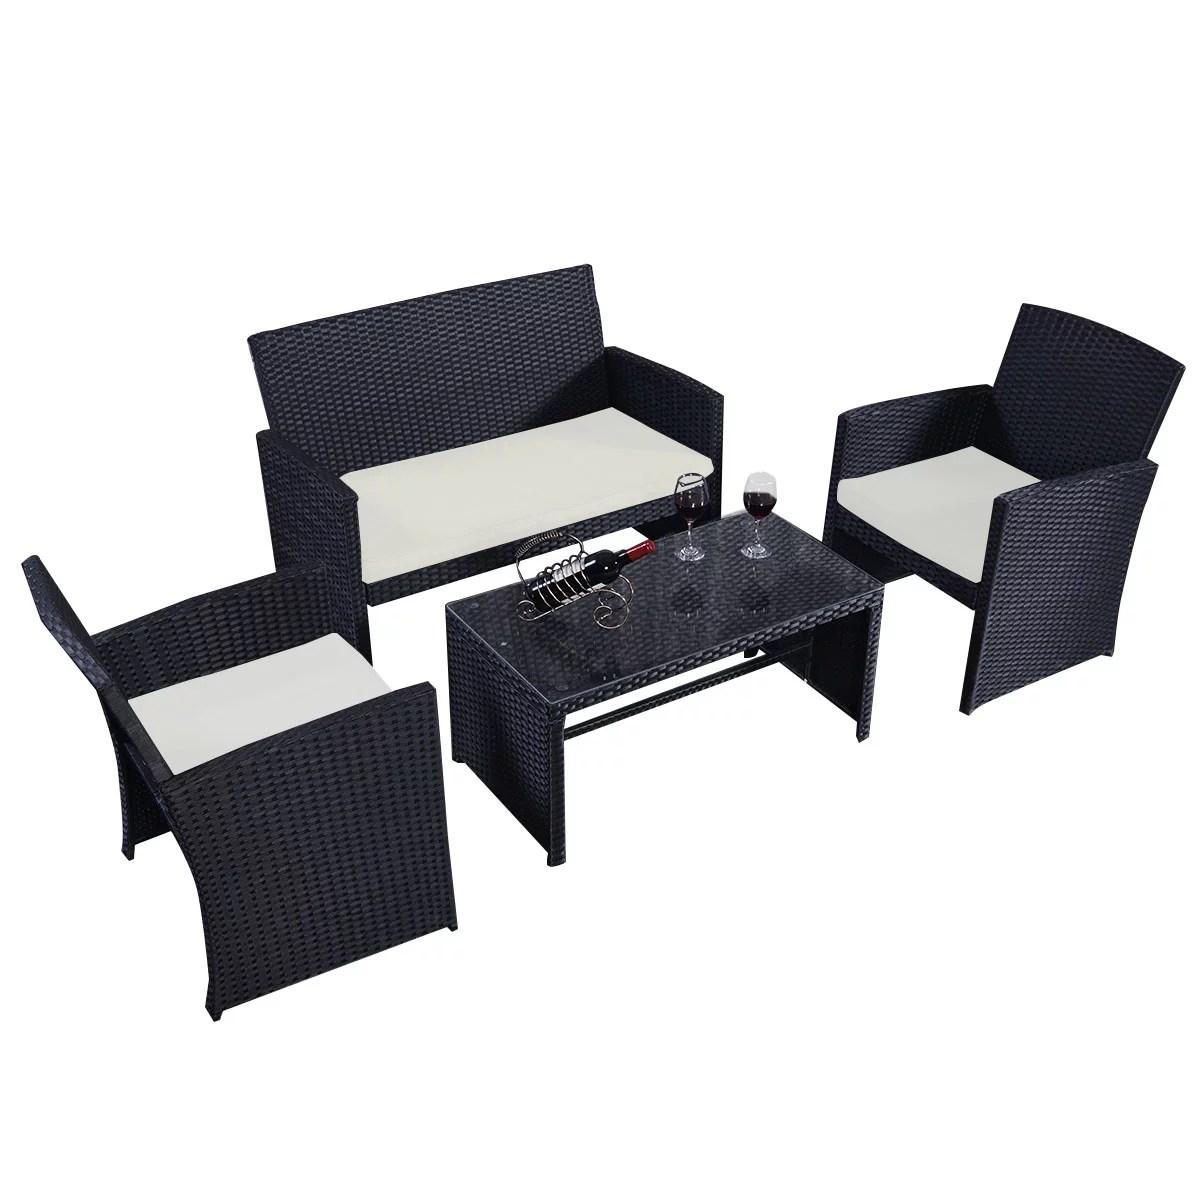 goplus 4 pc rattan patio furniture set garden lawn sofa wicker cushioned seat black walmart com